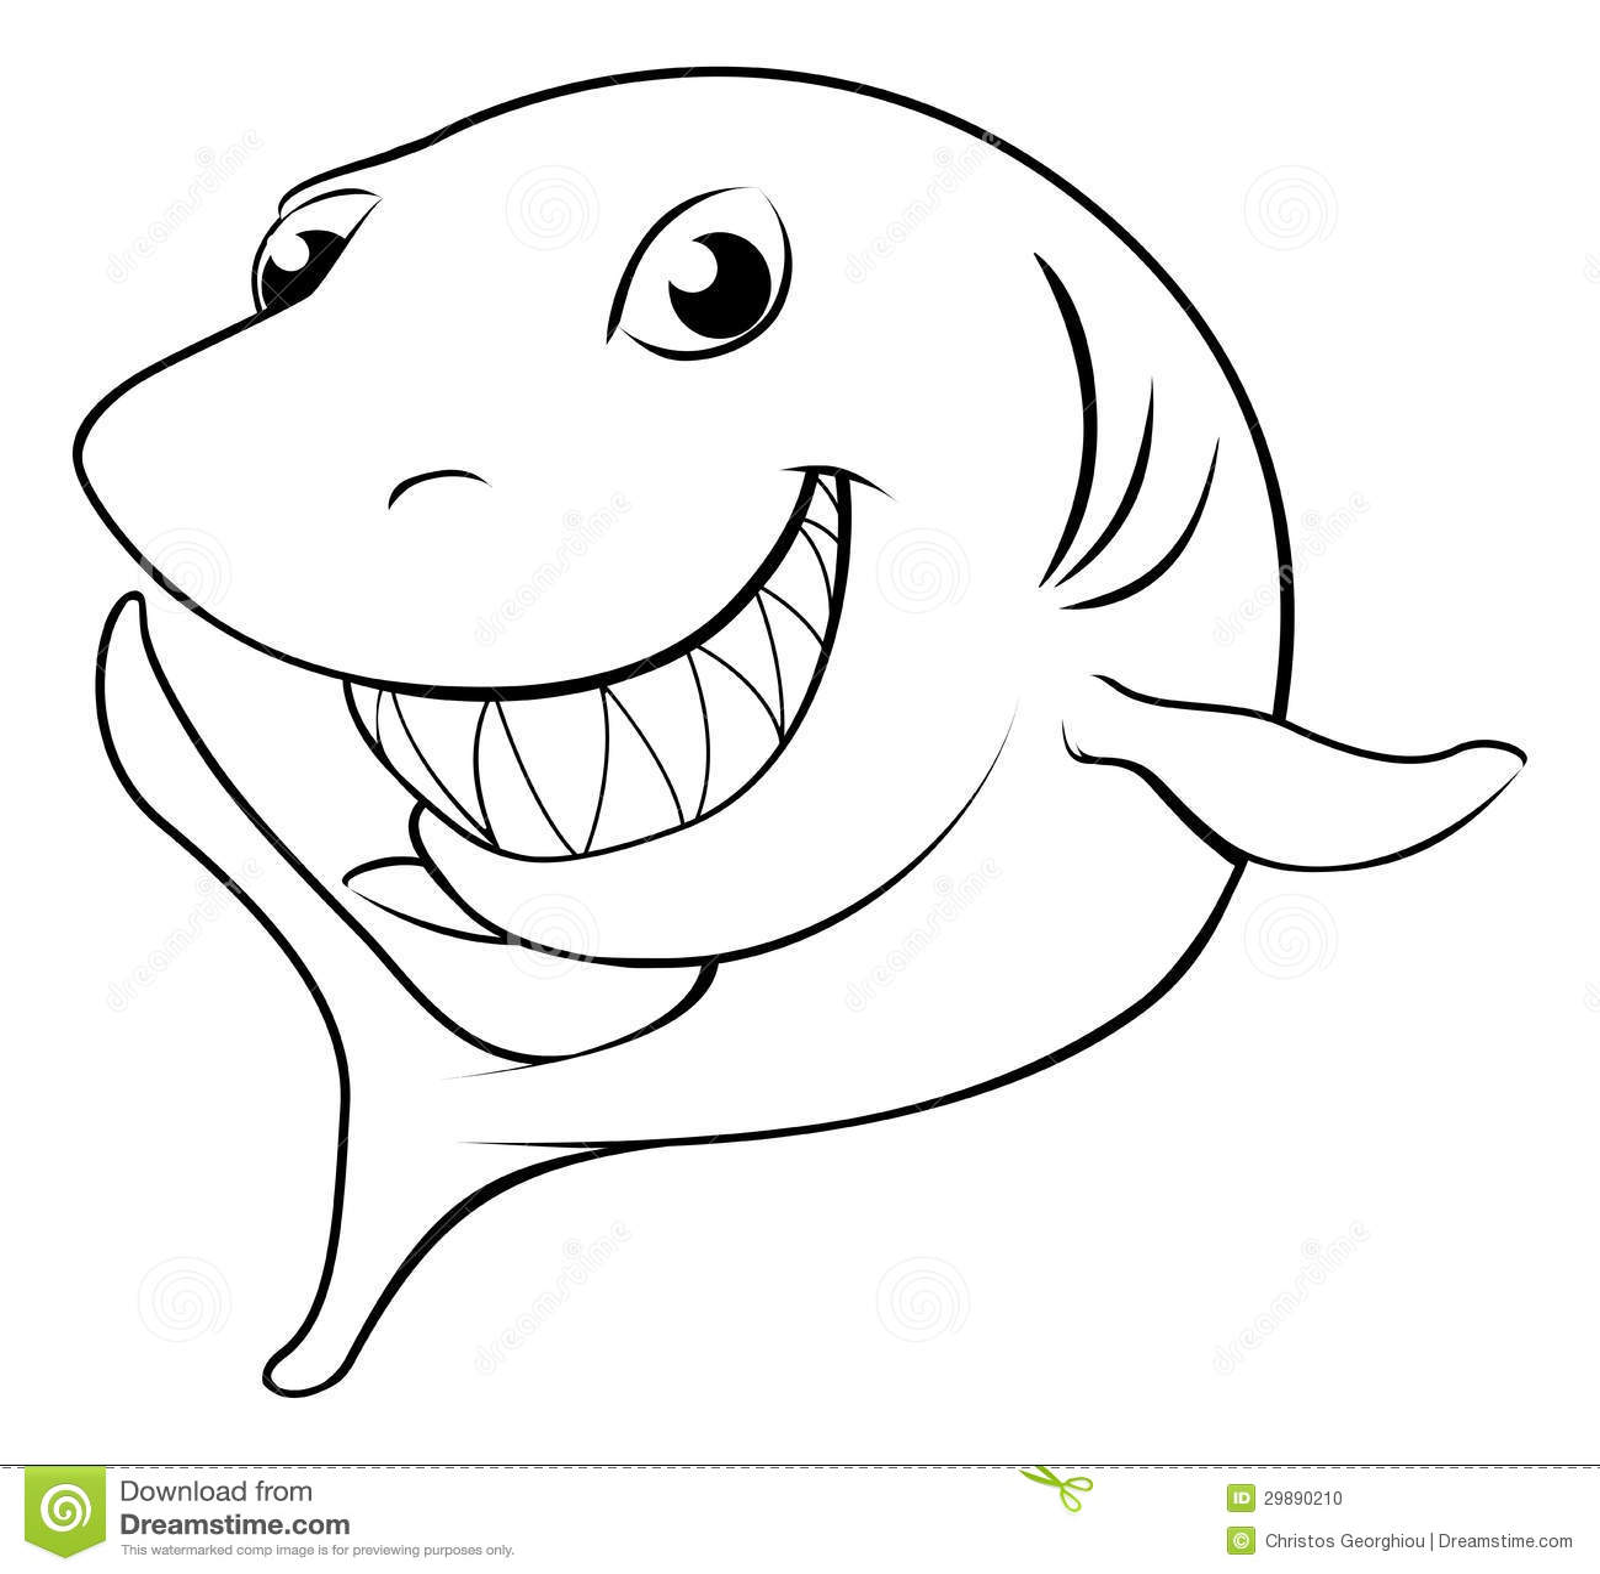 Black and white illustration of a happy cartoon shark